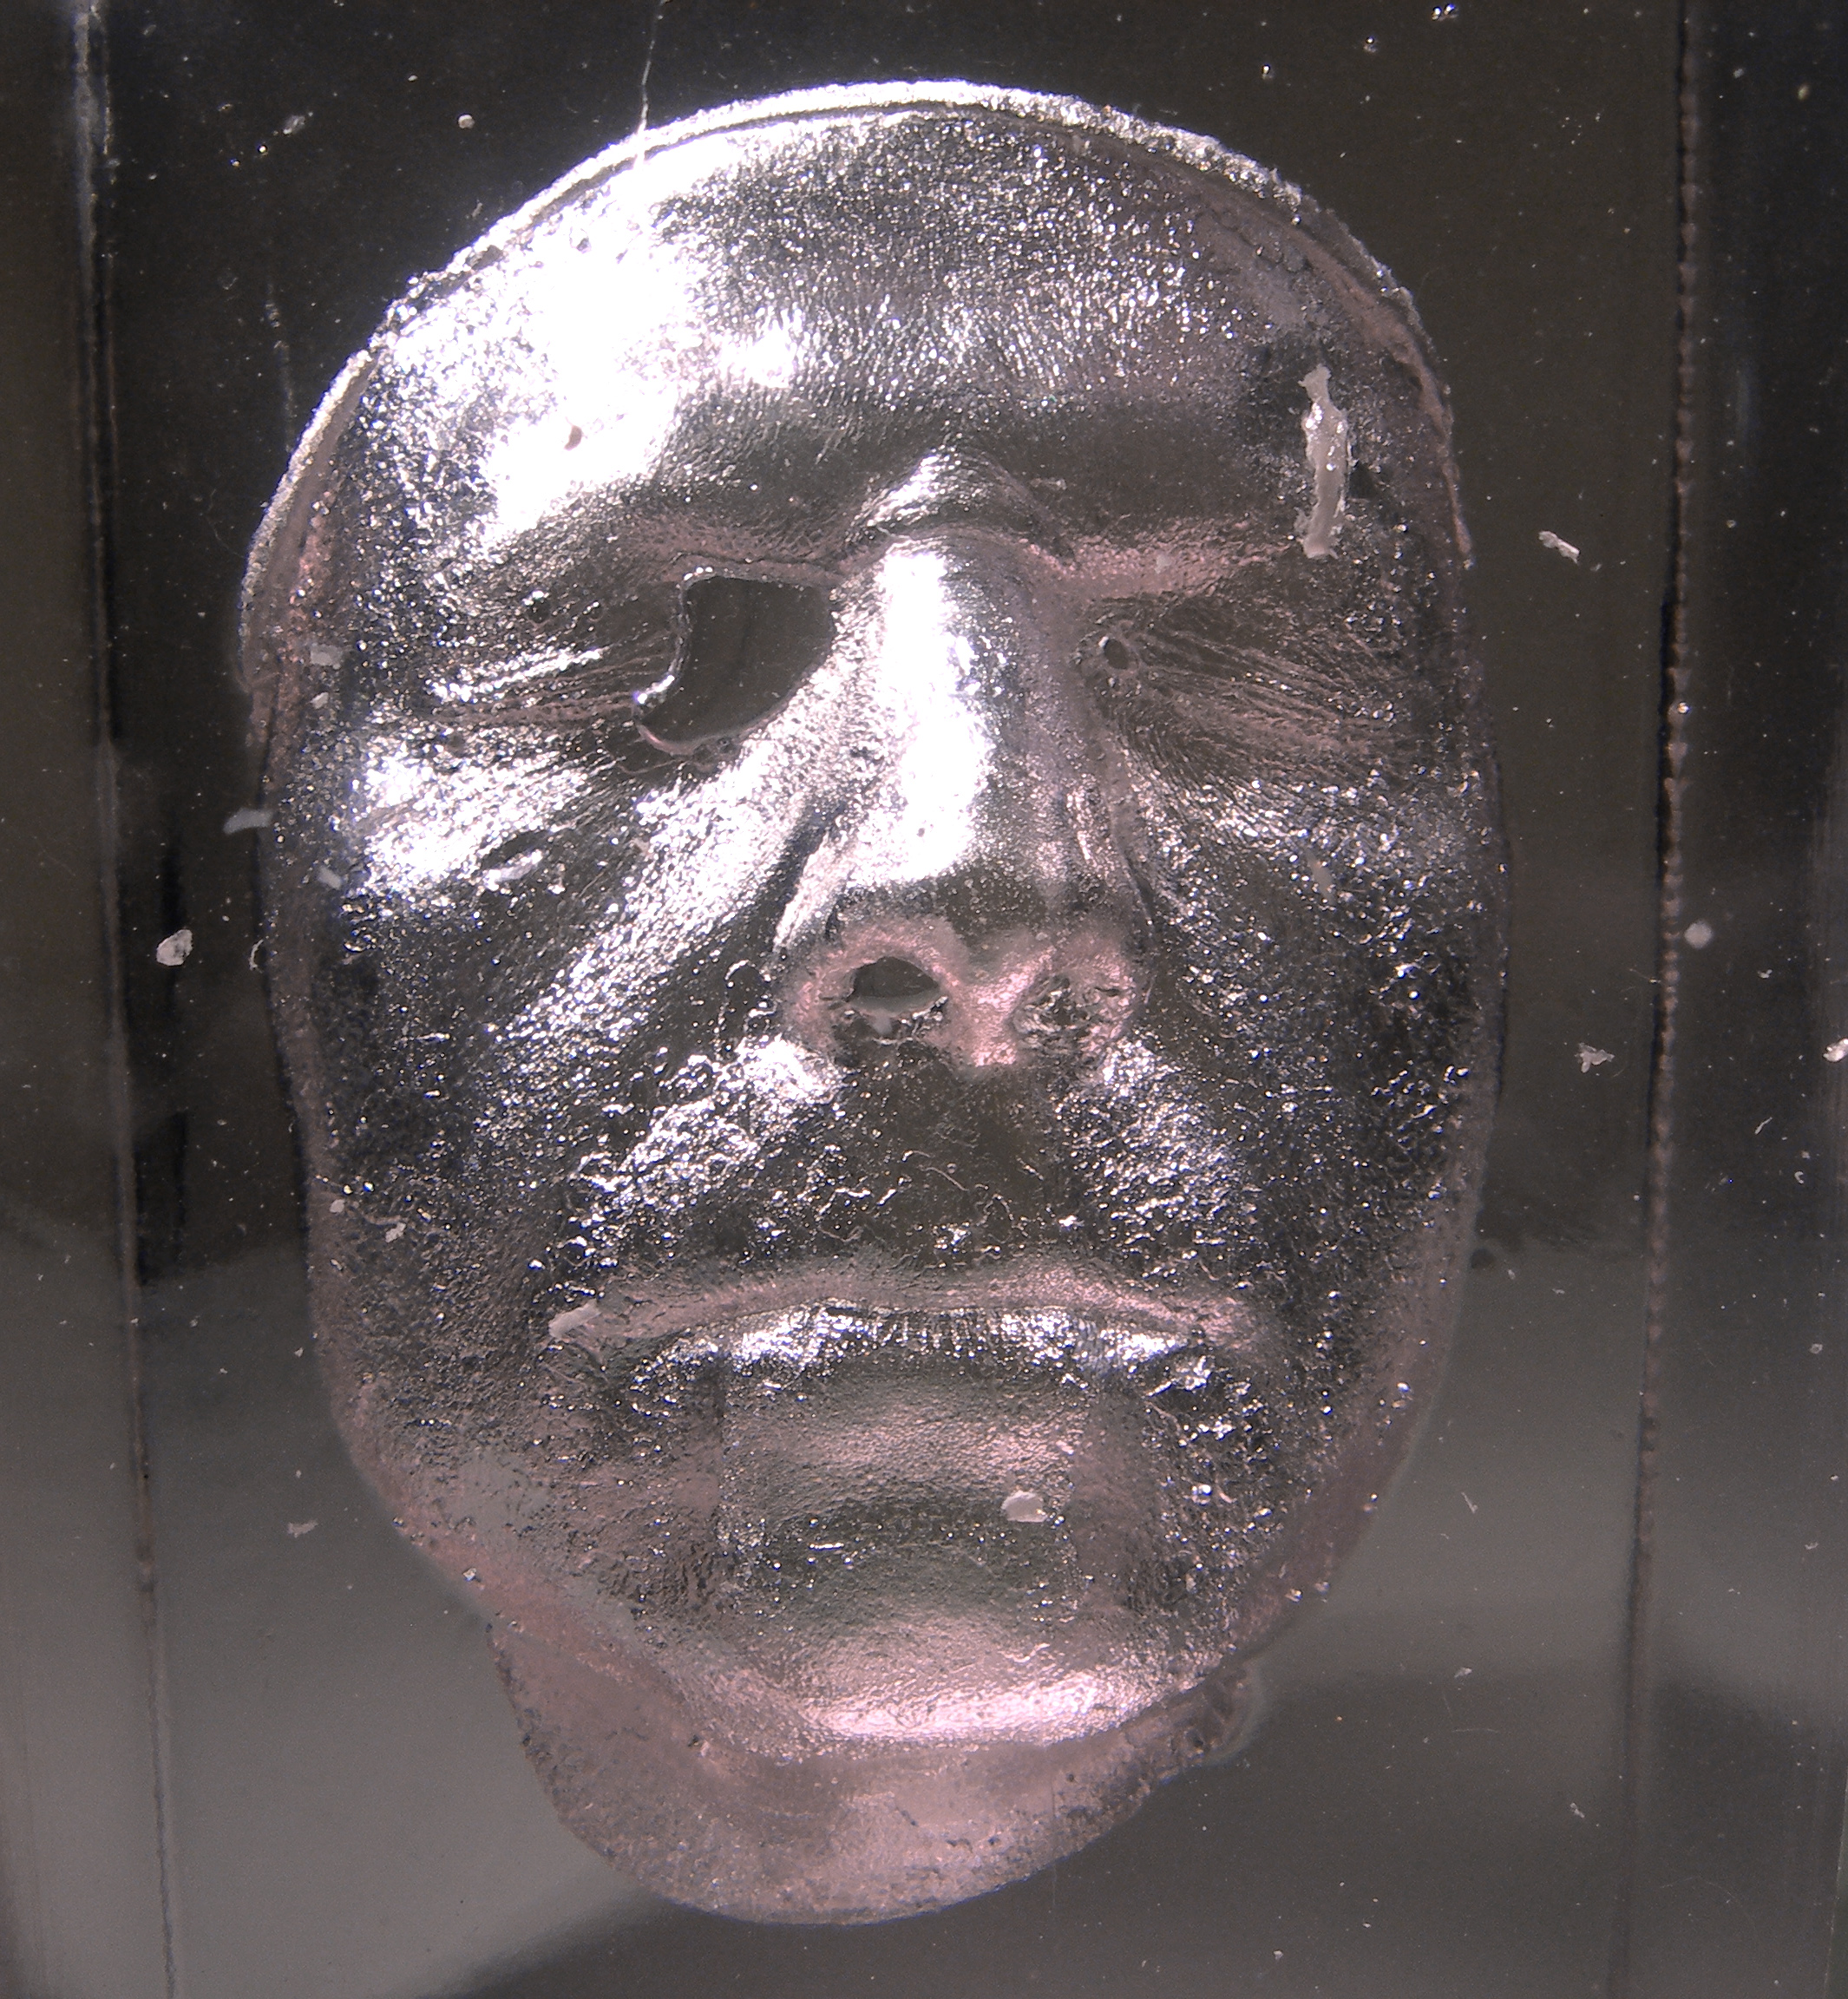 El rostro sin rostro I